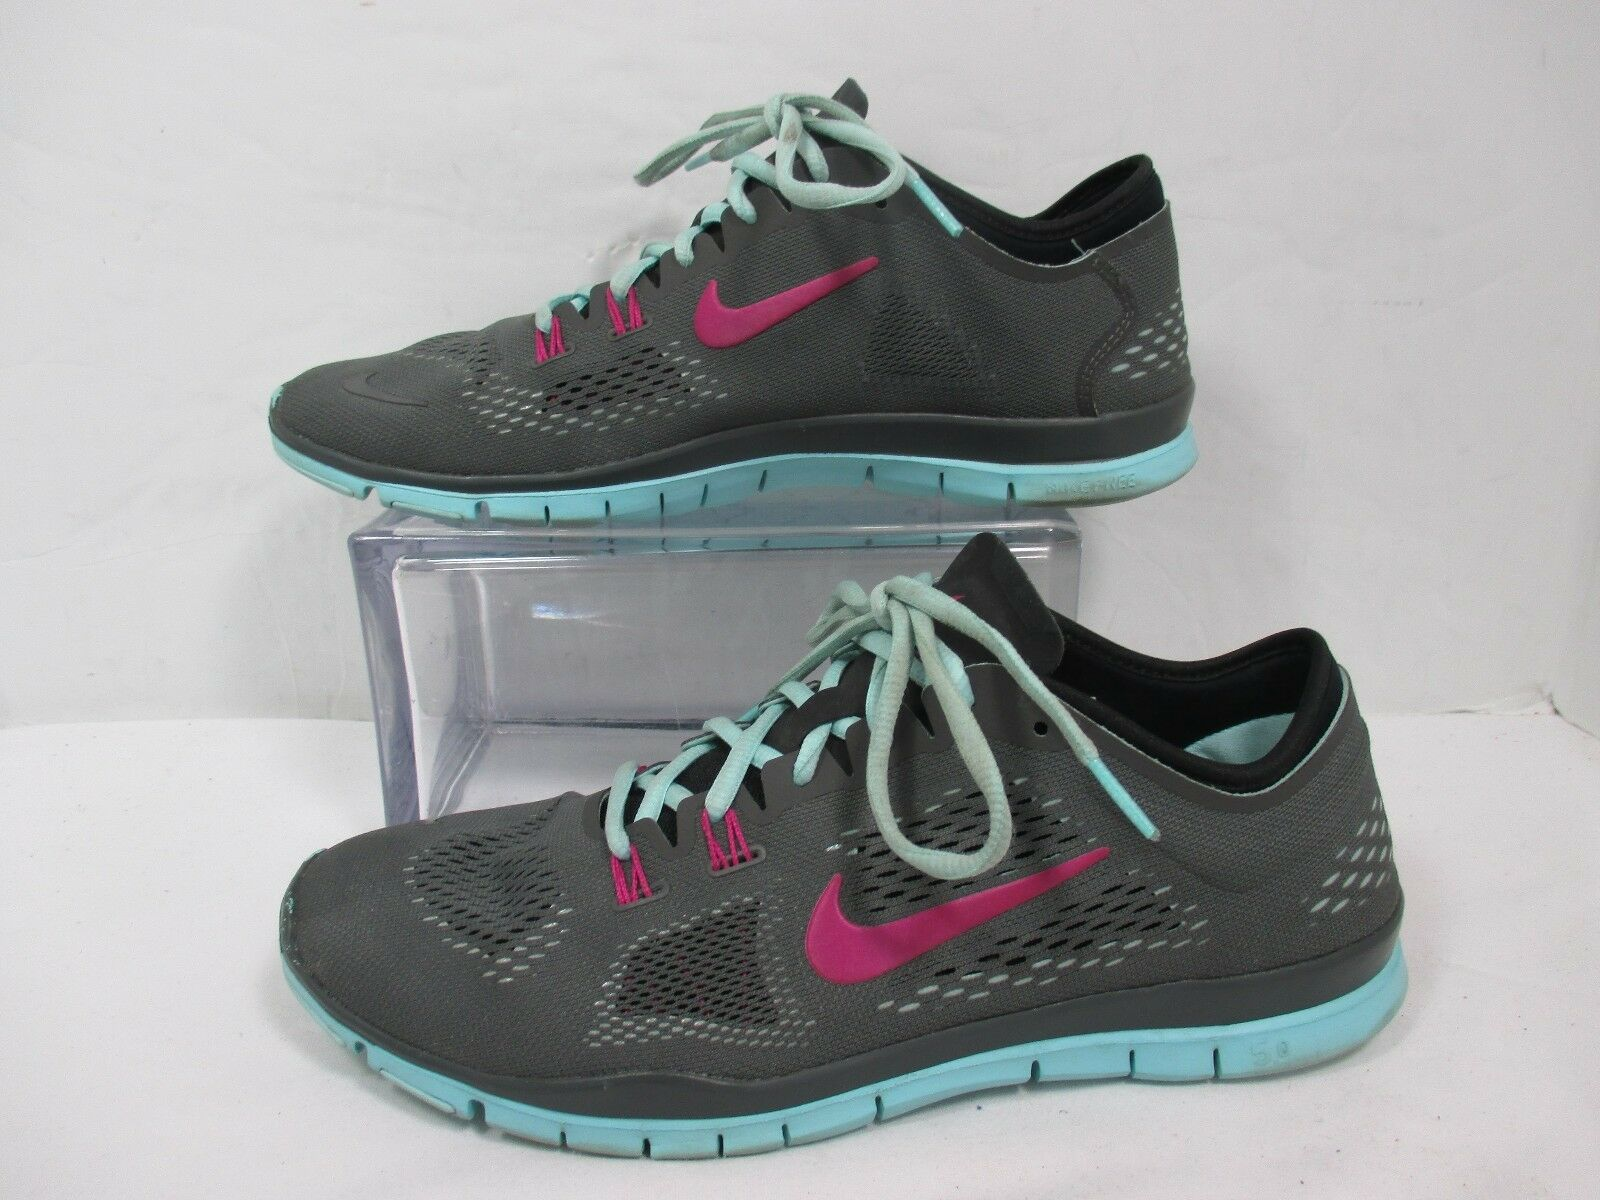 Nike Light Ash Grey/Hyper Turquoise  Free 5.0 TR Fit 4 Running Shoes Sz 10.5 Cheap women's shoes women's shoes